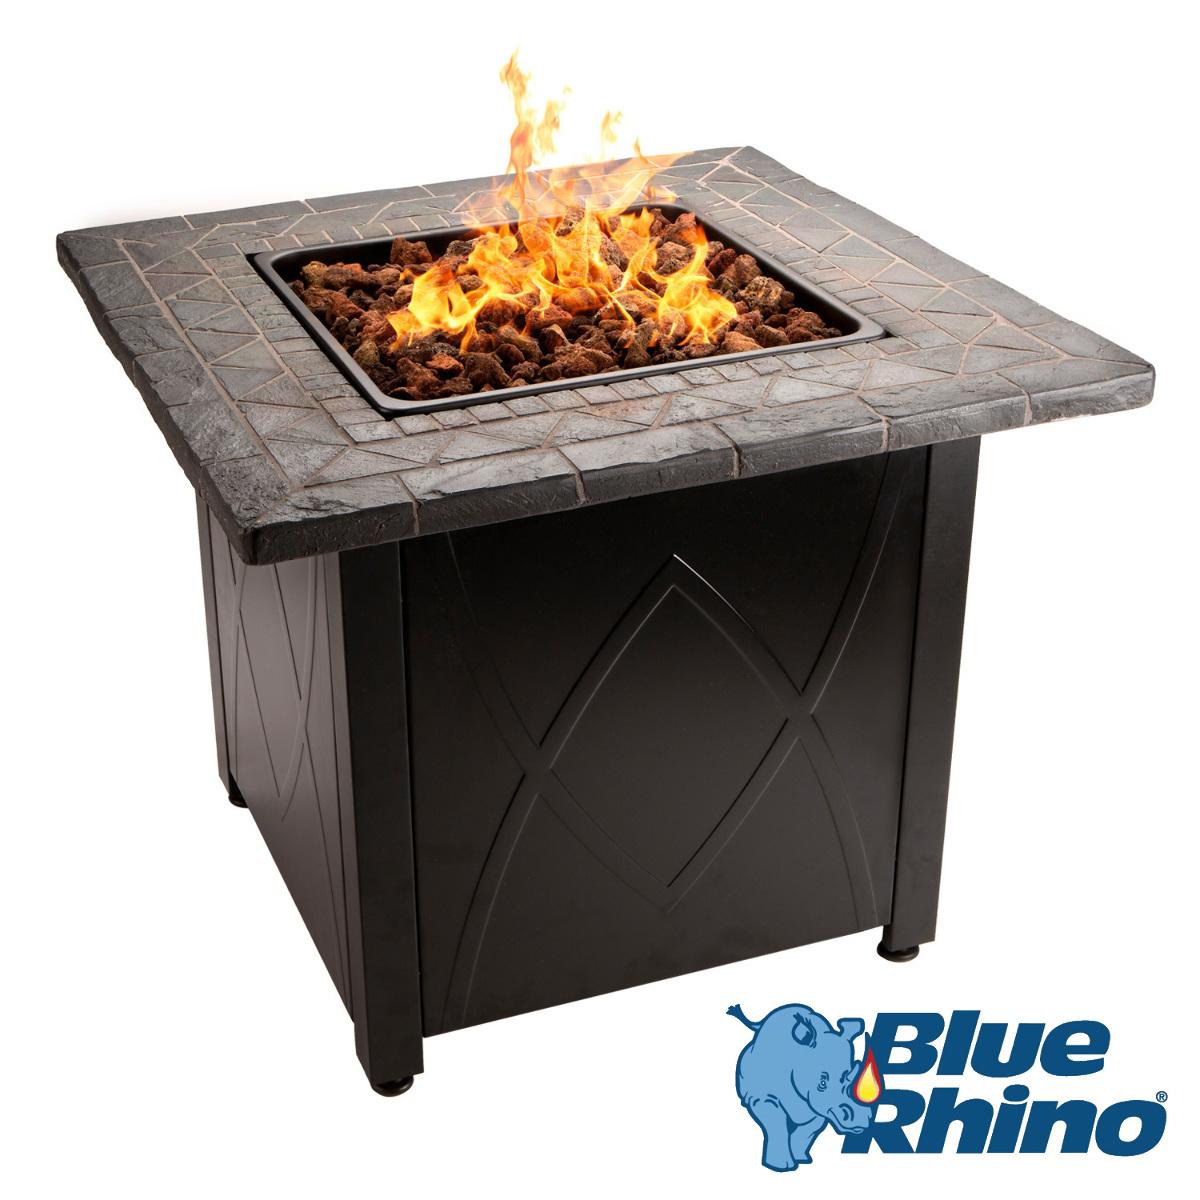 Blue Rhino Propane Gas Fire Pit